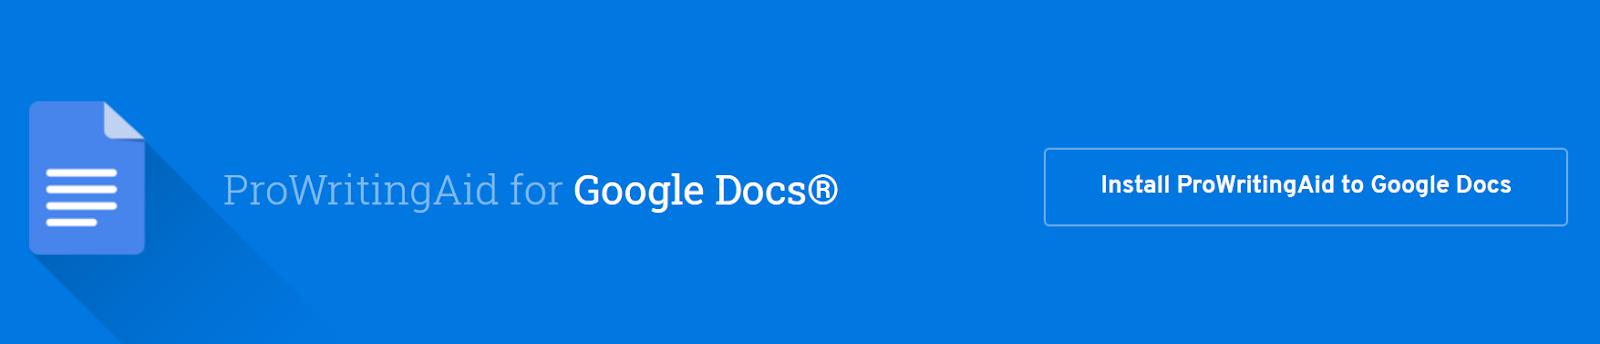 How to Use ProWritingAid with Google Docs ProWritingAid review